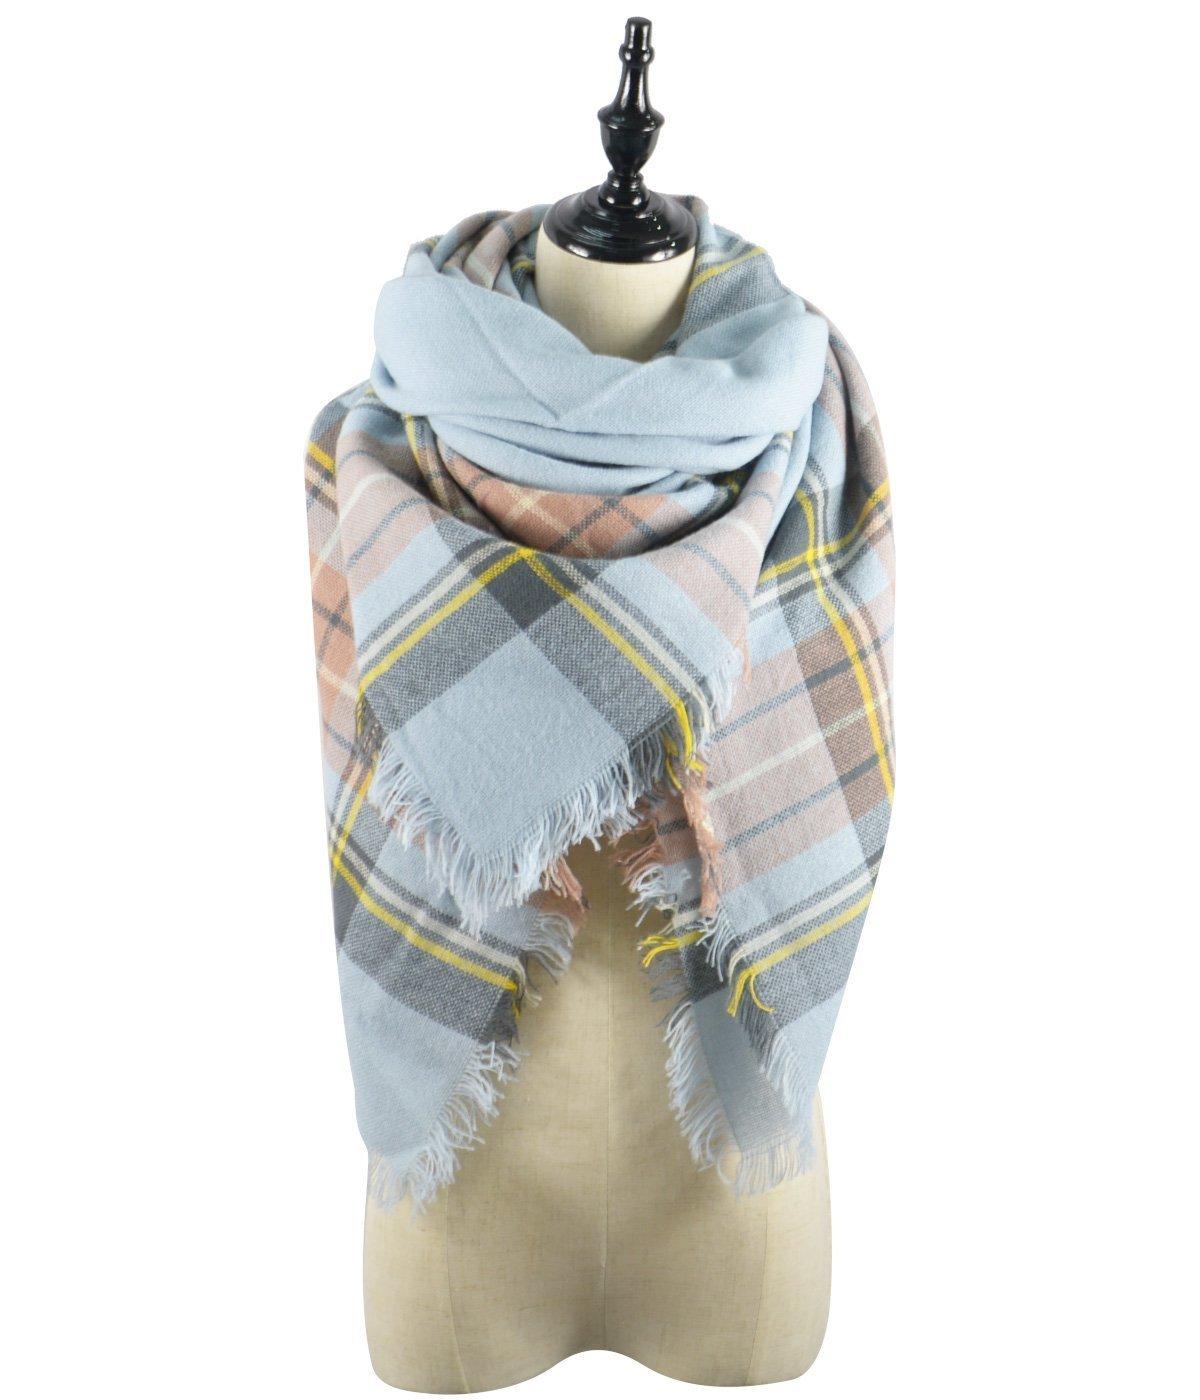 Century Star Women's Gorgeous Fall and Winter Plaid Blanket Scarf Warm Tartan Wrap Shawl Light Blue